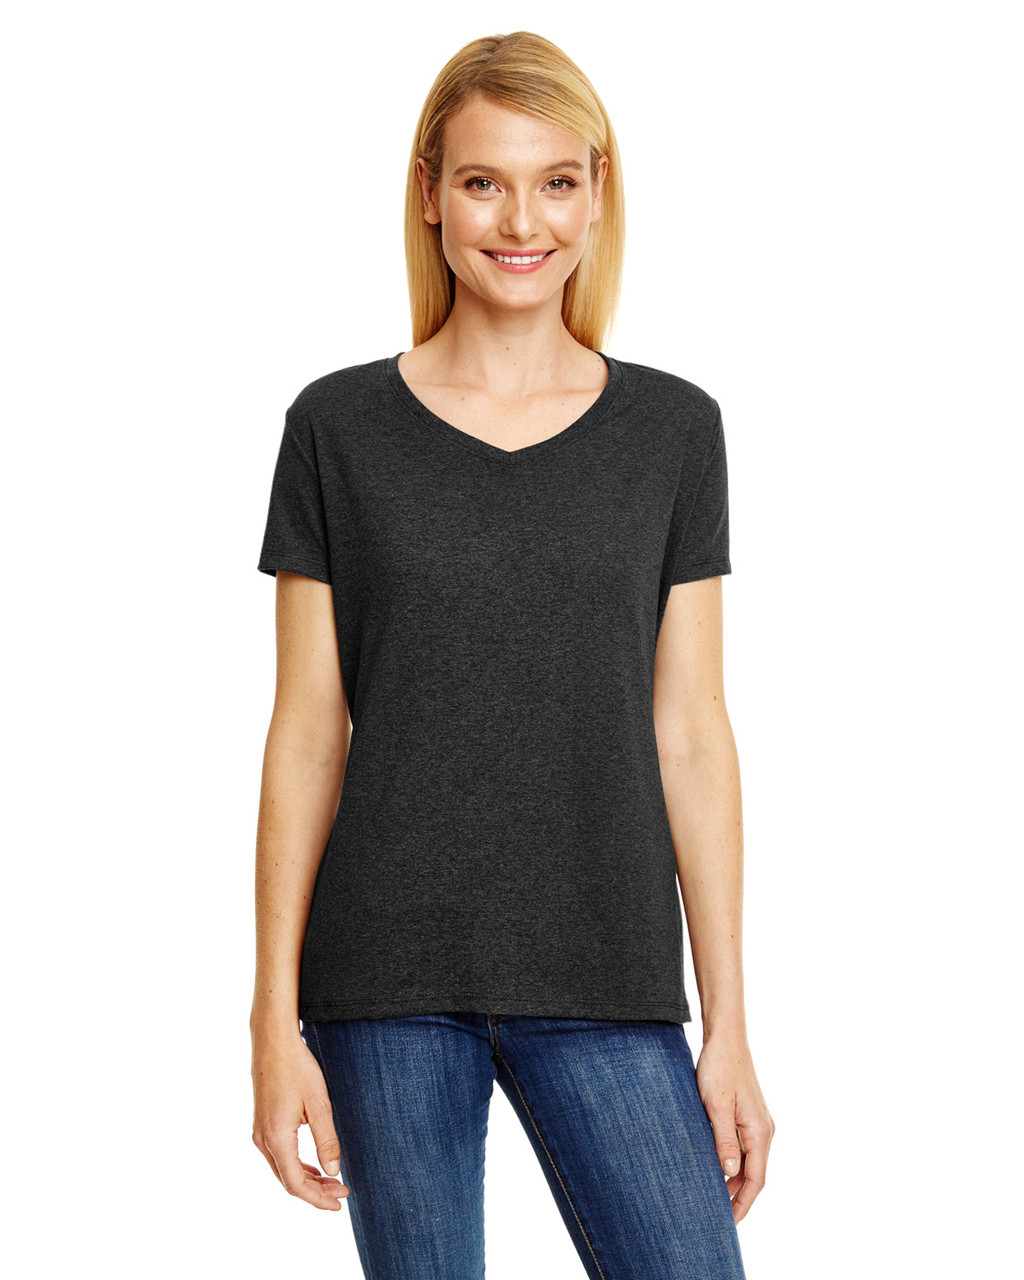 bd01b303 Hanes 42VT Ladies' X-Temp® Triblend V-Neck T-Shirt - ClothingAuthority.com